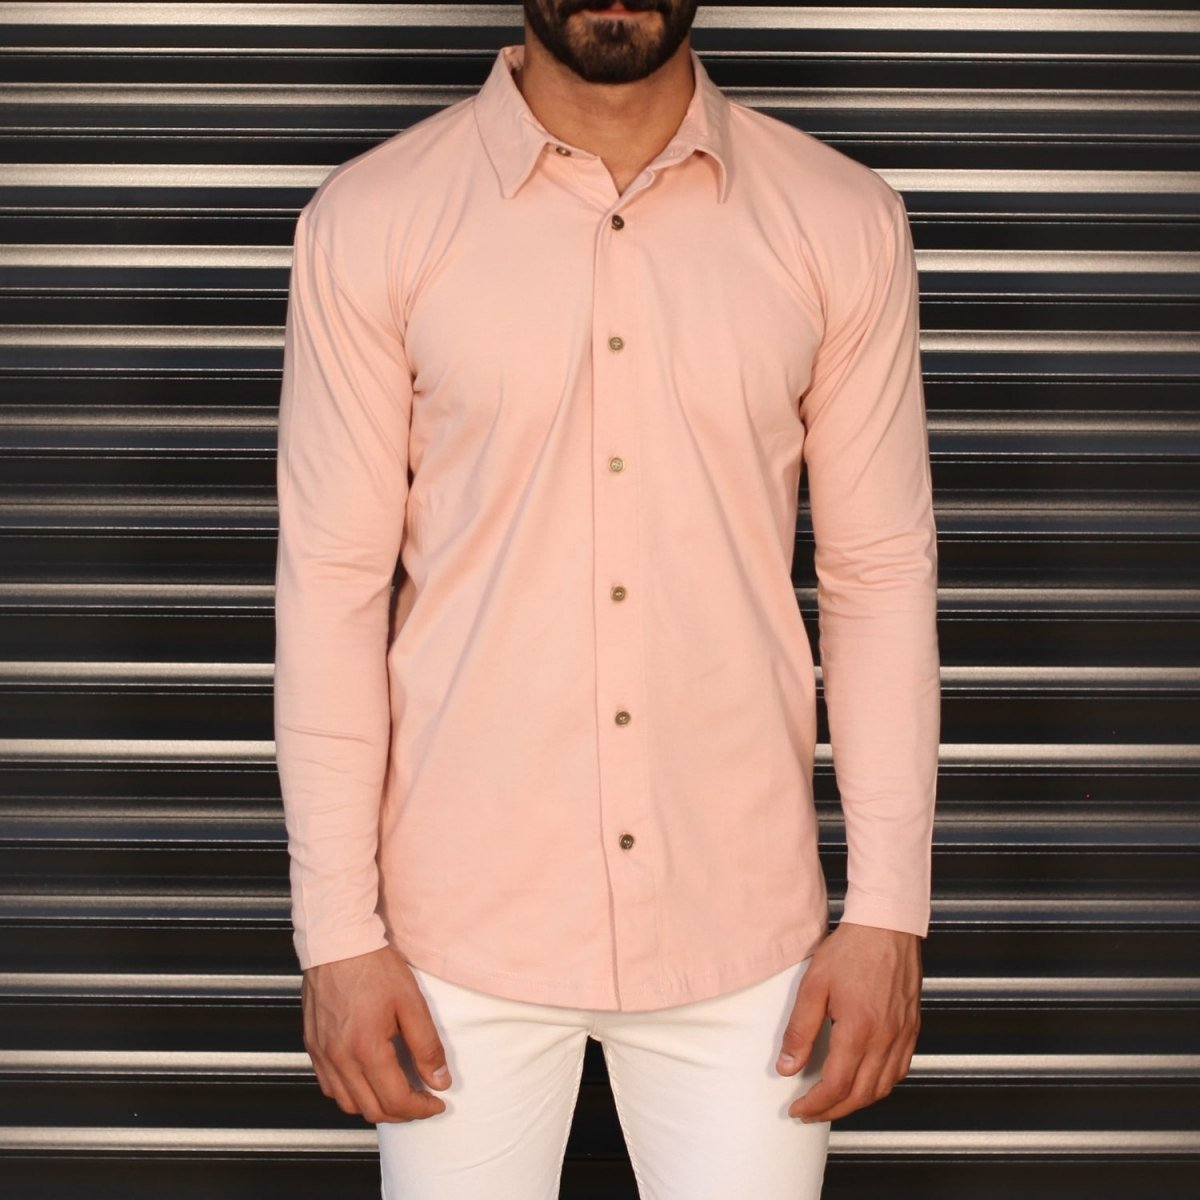 Men's Regular Long Sleeve Casual Shirt In Pink Mv Premium Brand - 1